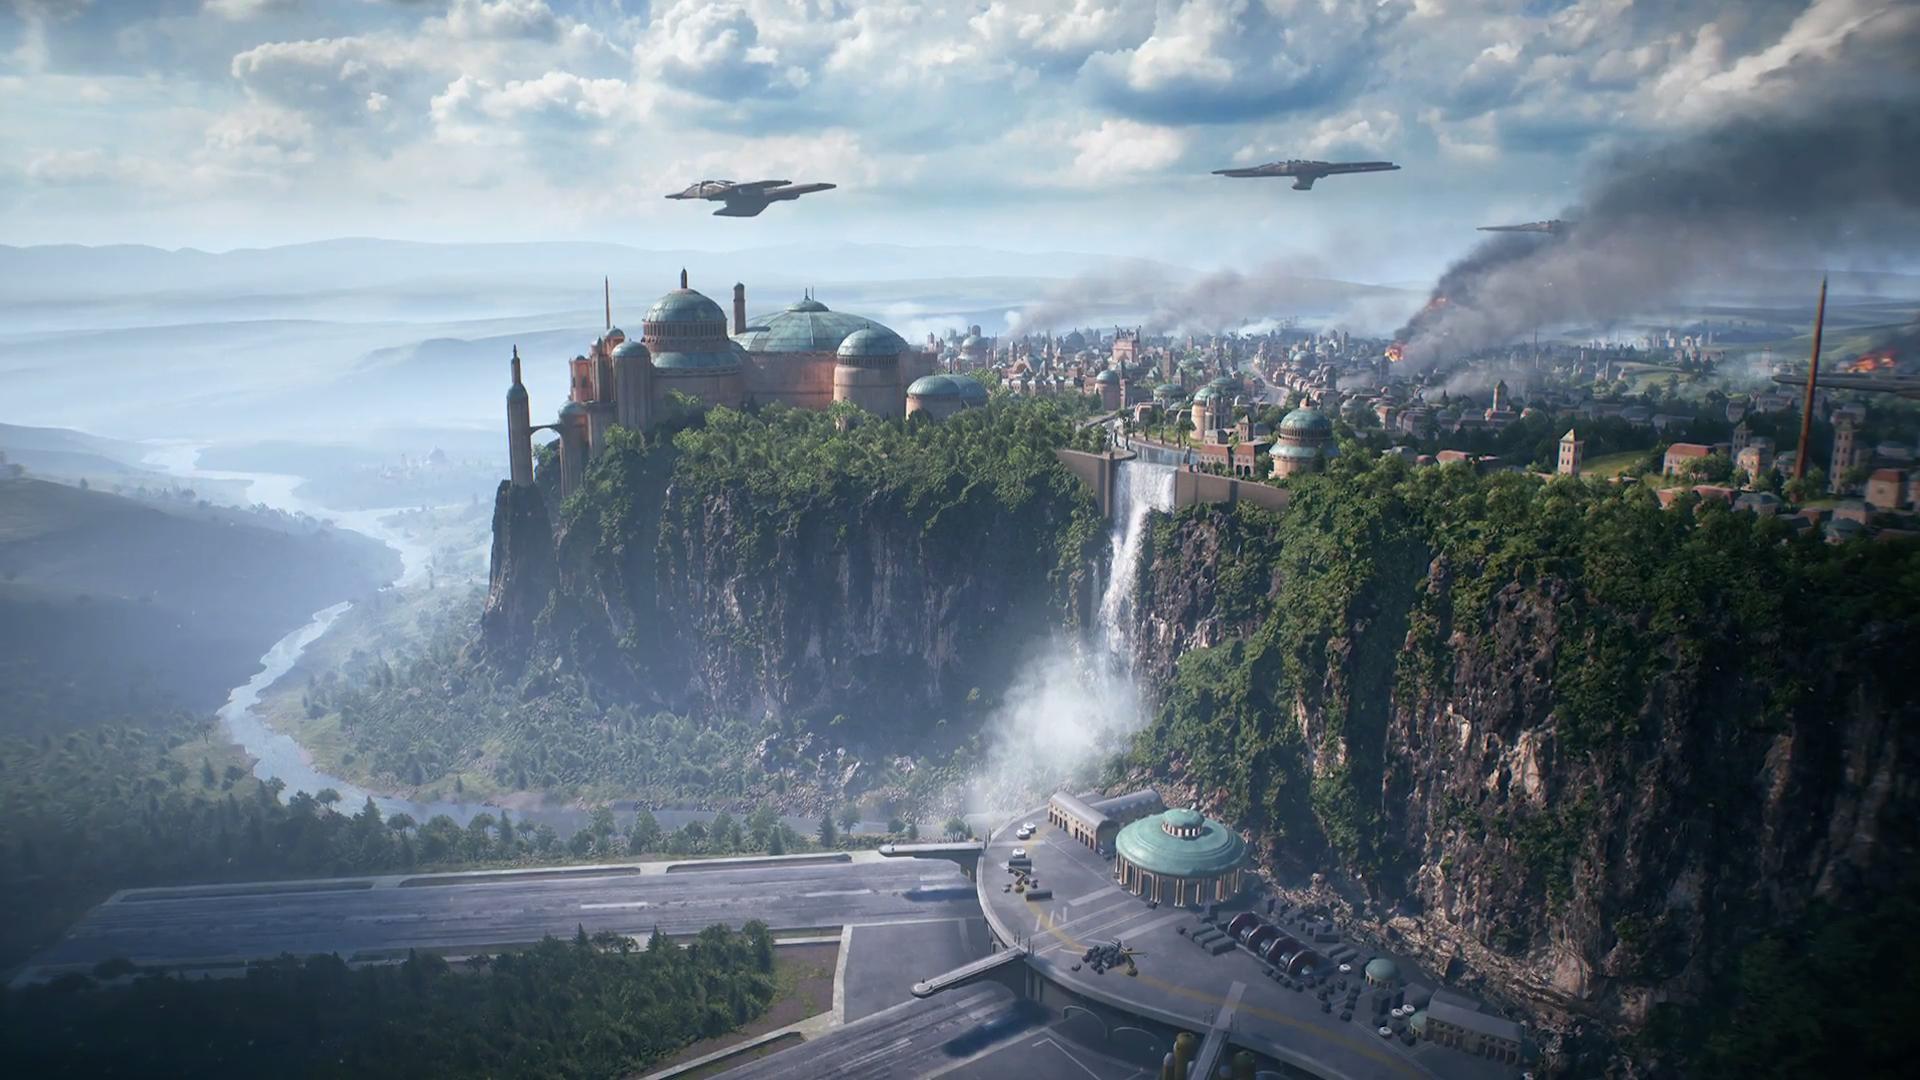 Conheçam o planeta Naboo de Star Wars Battlefront II